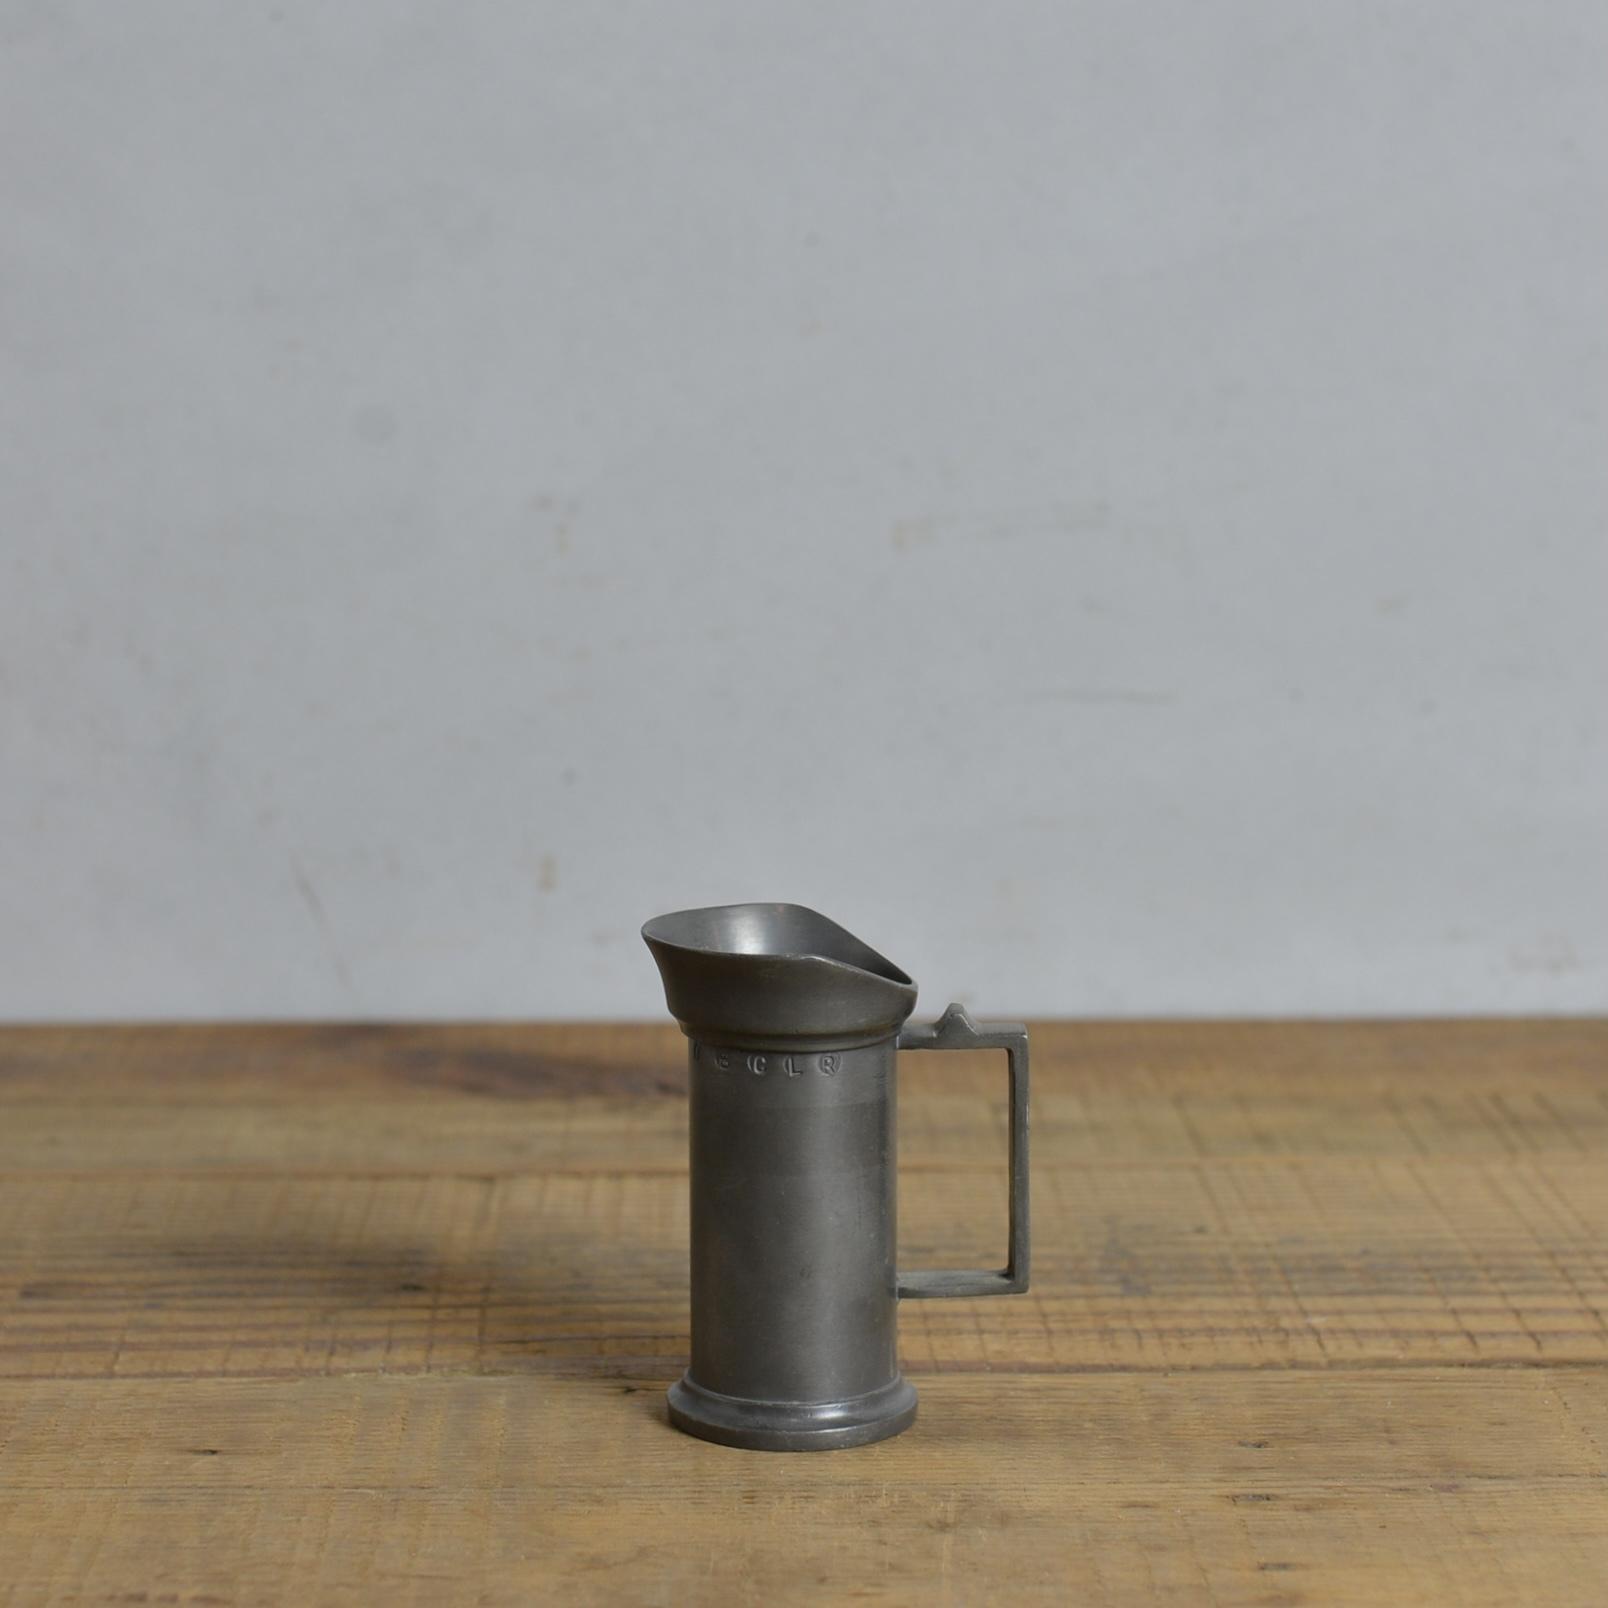 Pewter Measure Cup / ピューター メジャーカップ 〈計量カップ・ペン立て・花器・一輪挿し・アンティーク・ヴィンテージ〉 112260